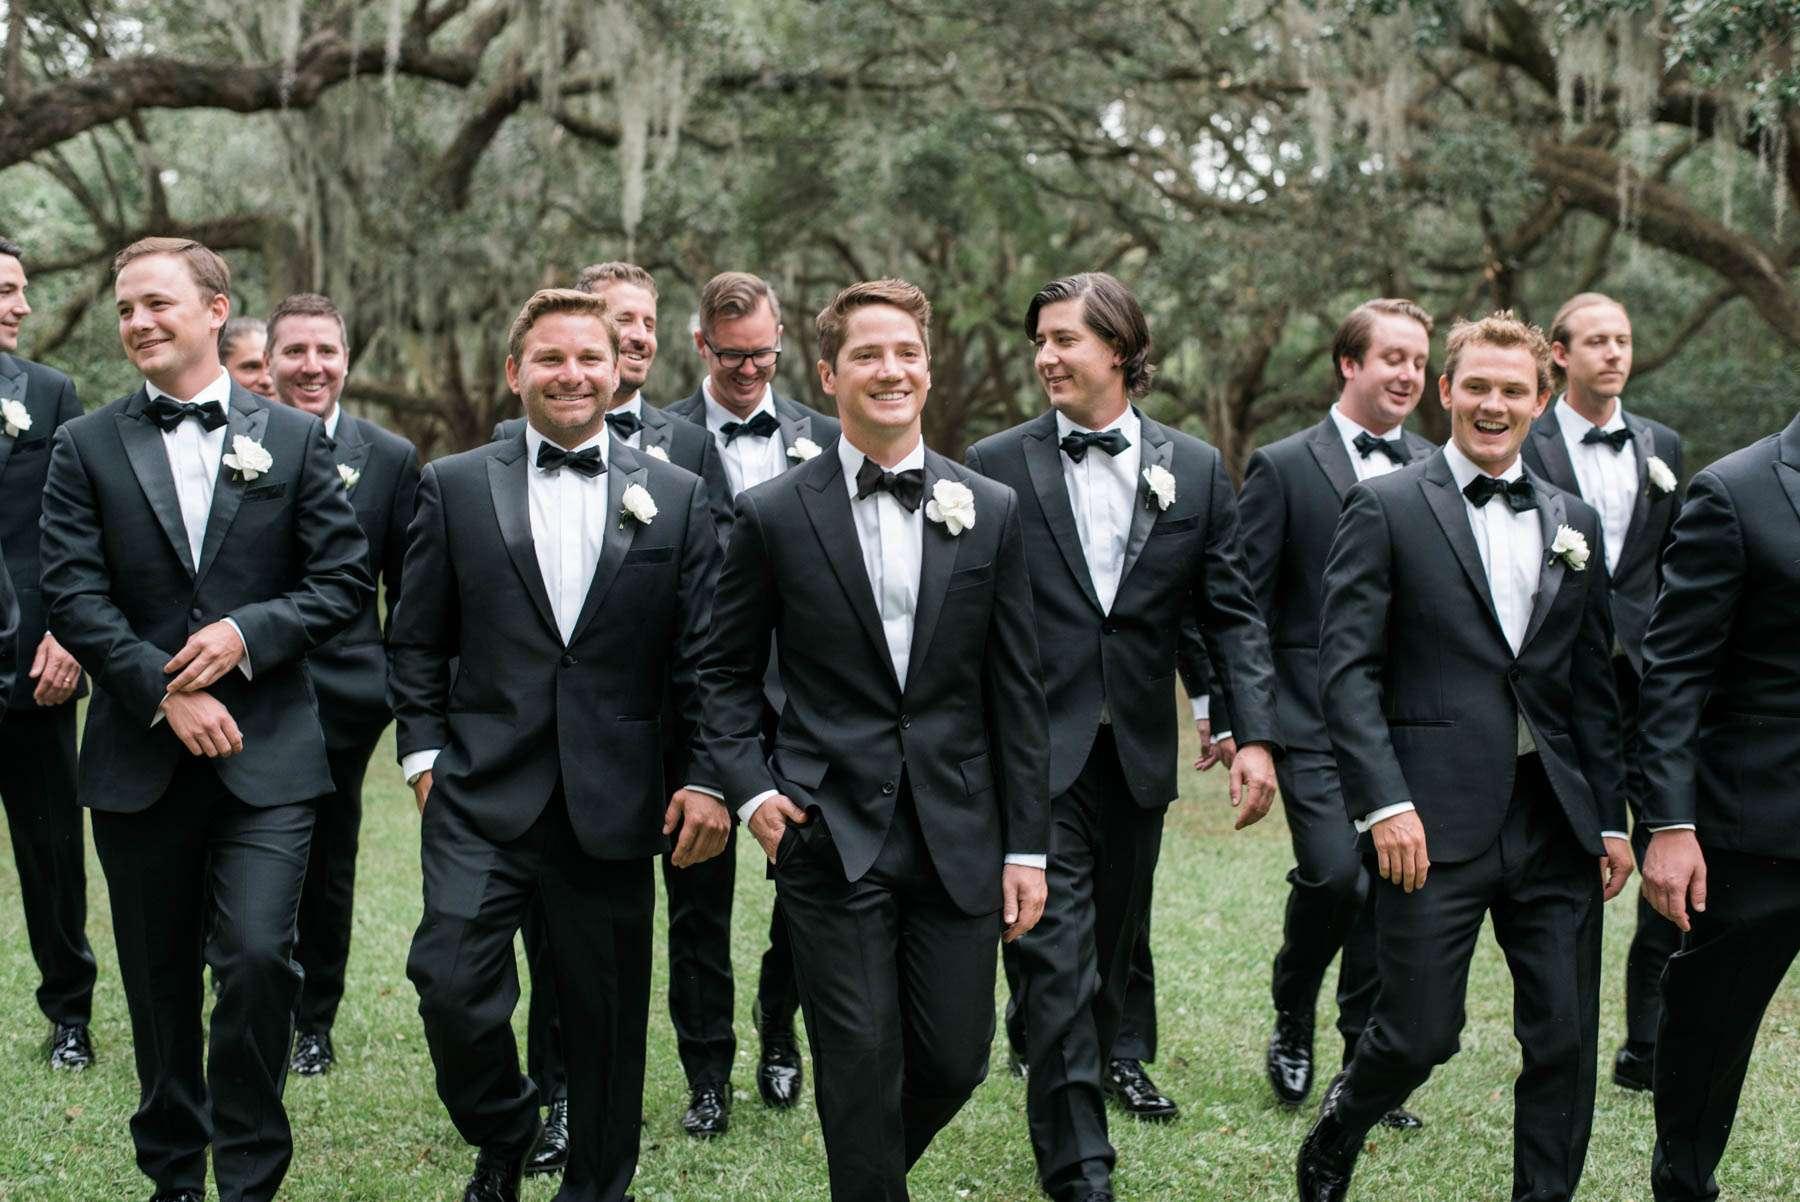 Groom + Groomsmen in Charleston on Wedding Day / Jillian Attaway of Rhyme & Reason's Charleston Wedding on Southern Weddings